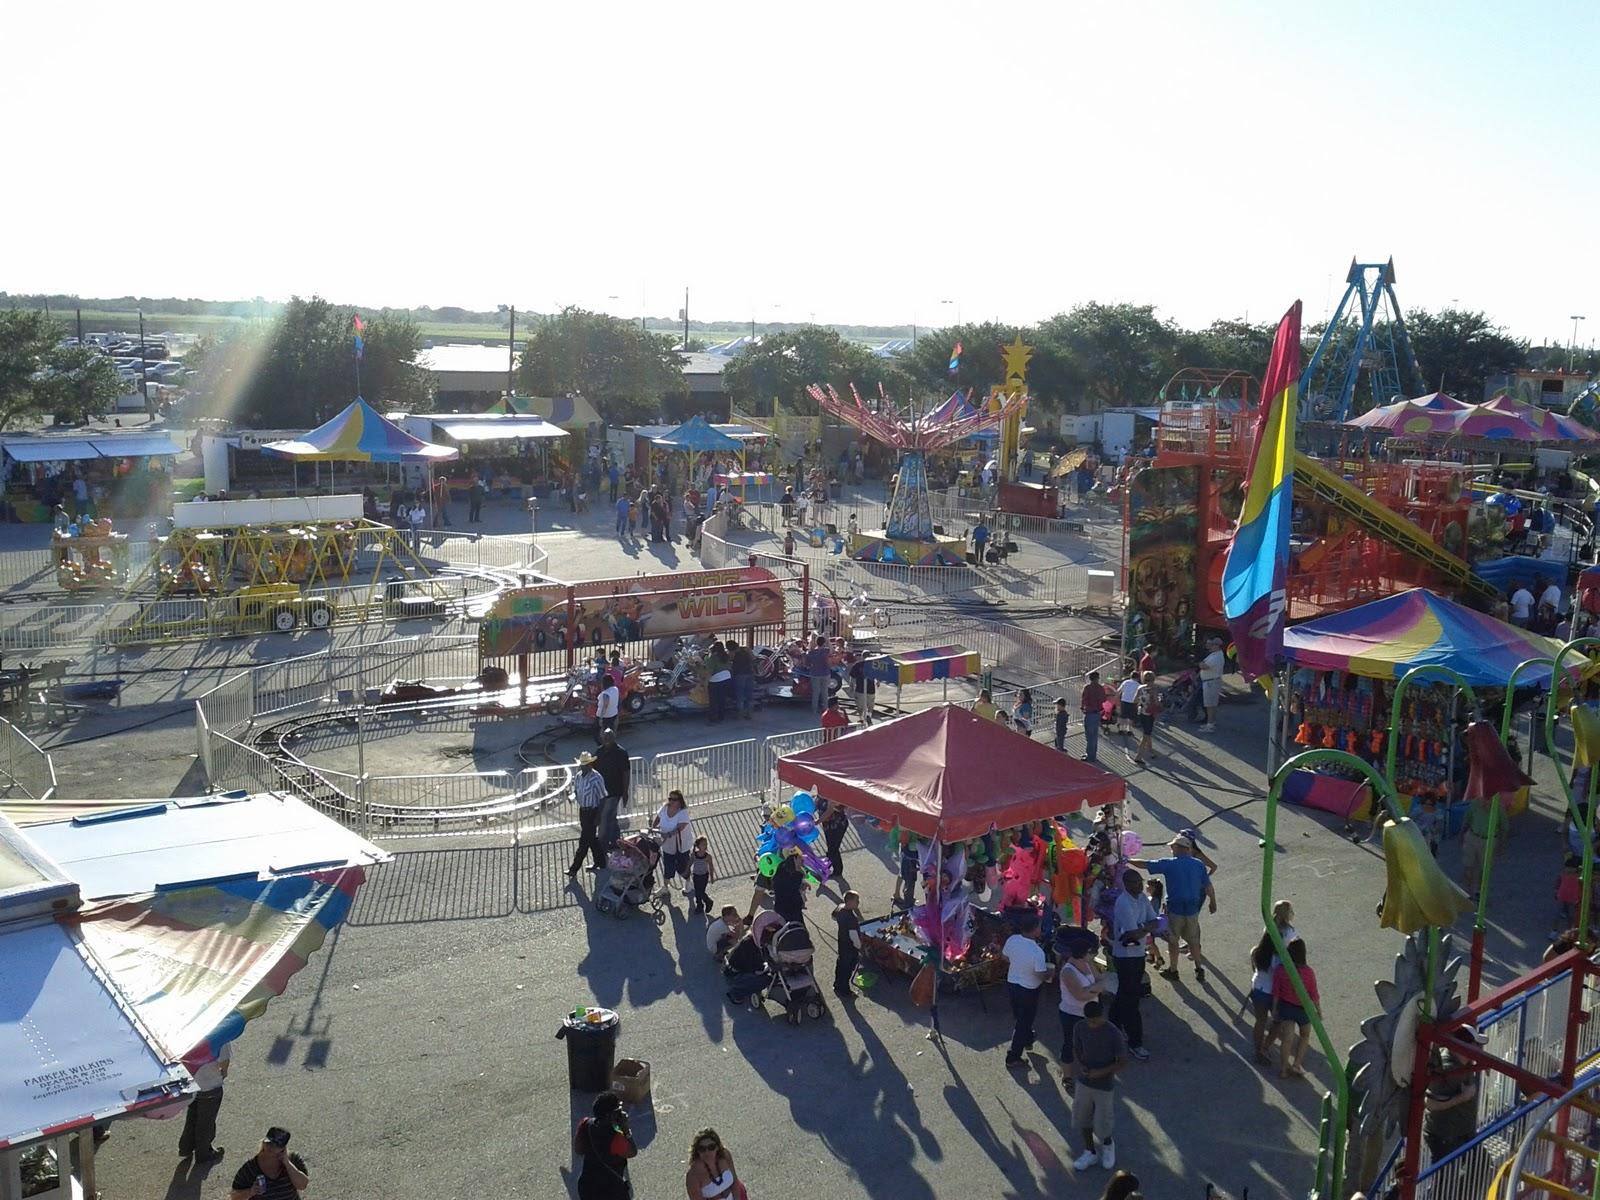 Fort Bend County Fair 2011 - IMG_20111001_174750.jpg